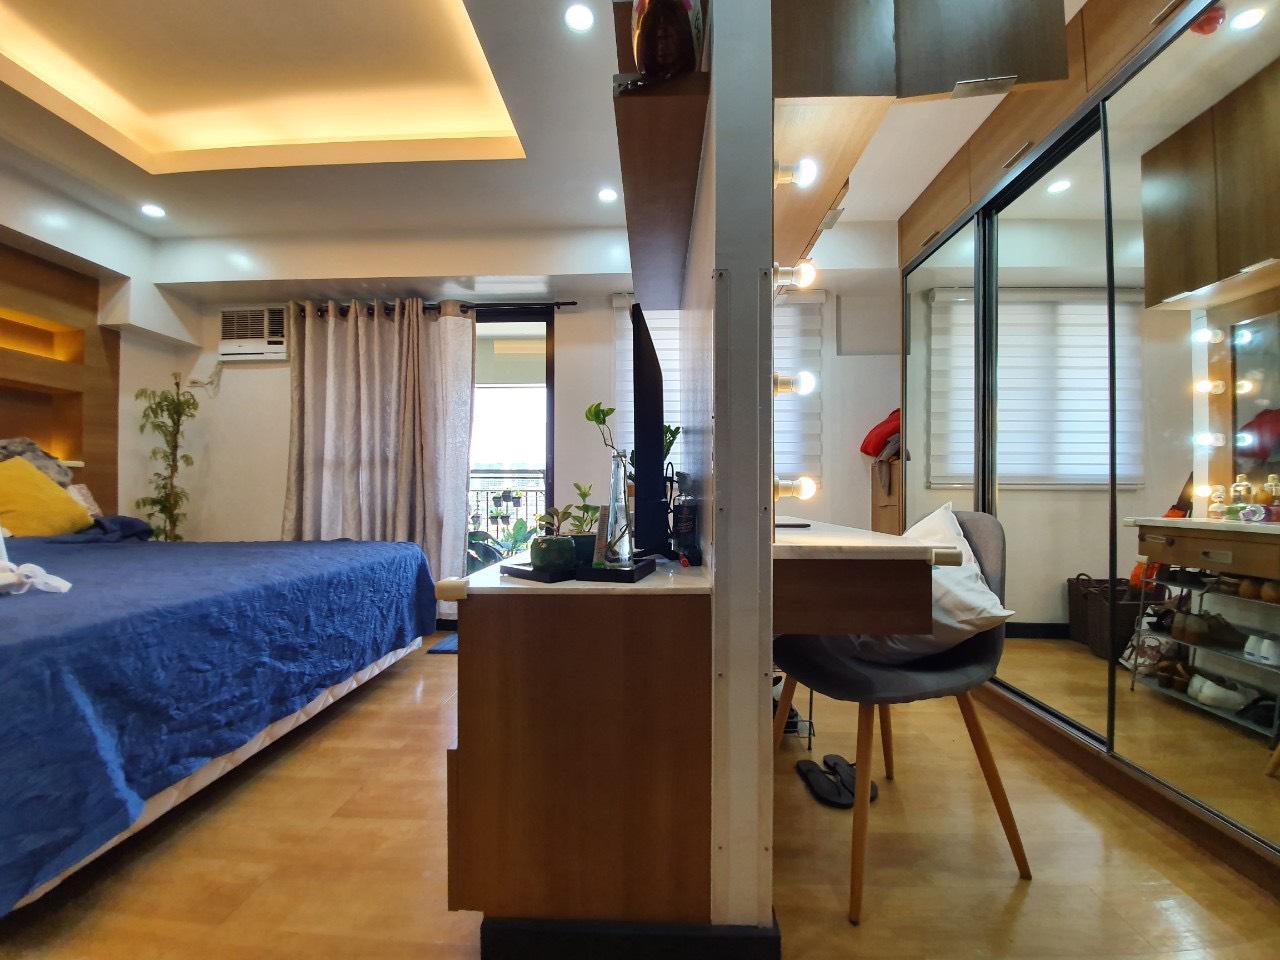 2BR Condo For Sale, Royal Palm Residences, Acacia Estate 3